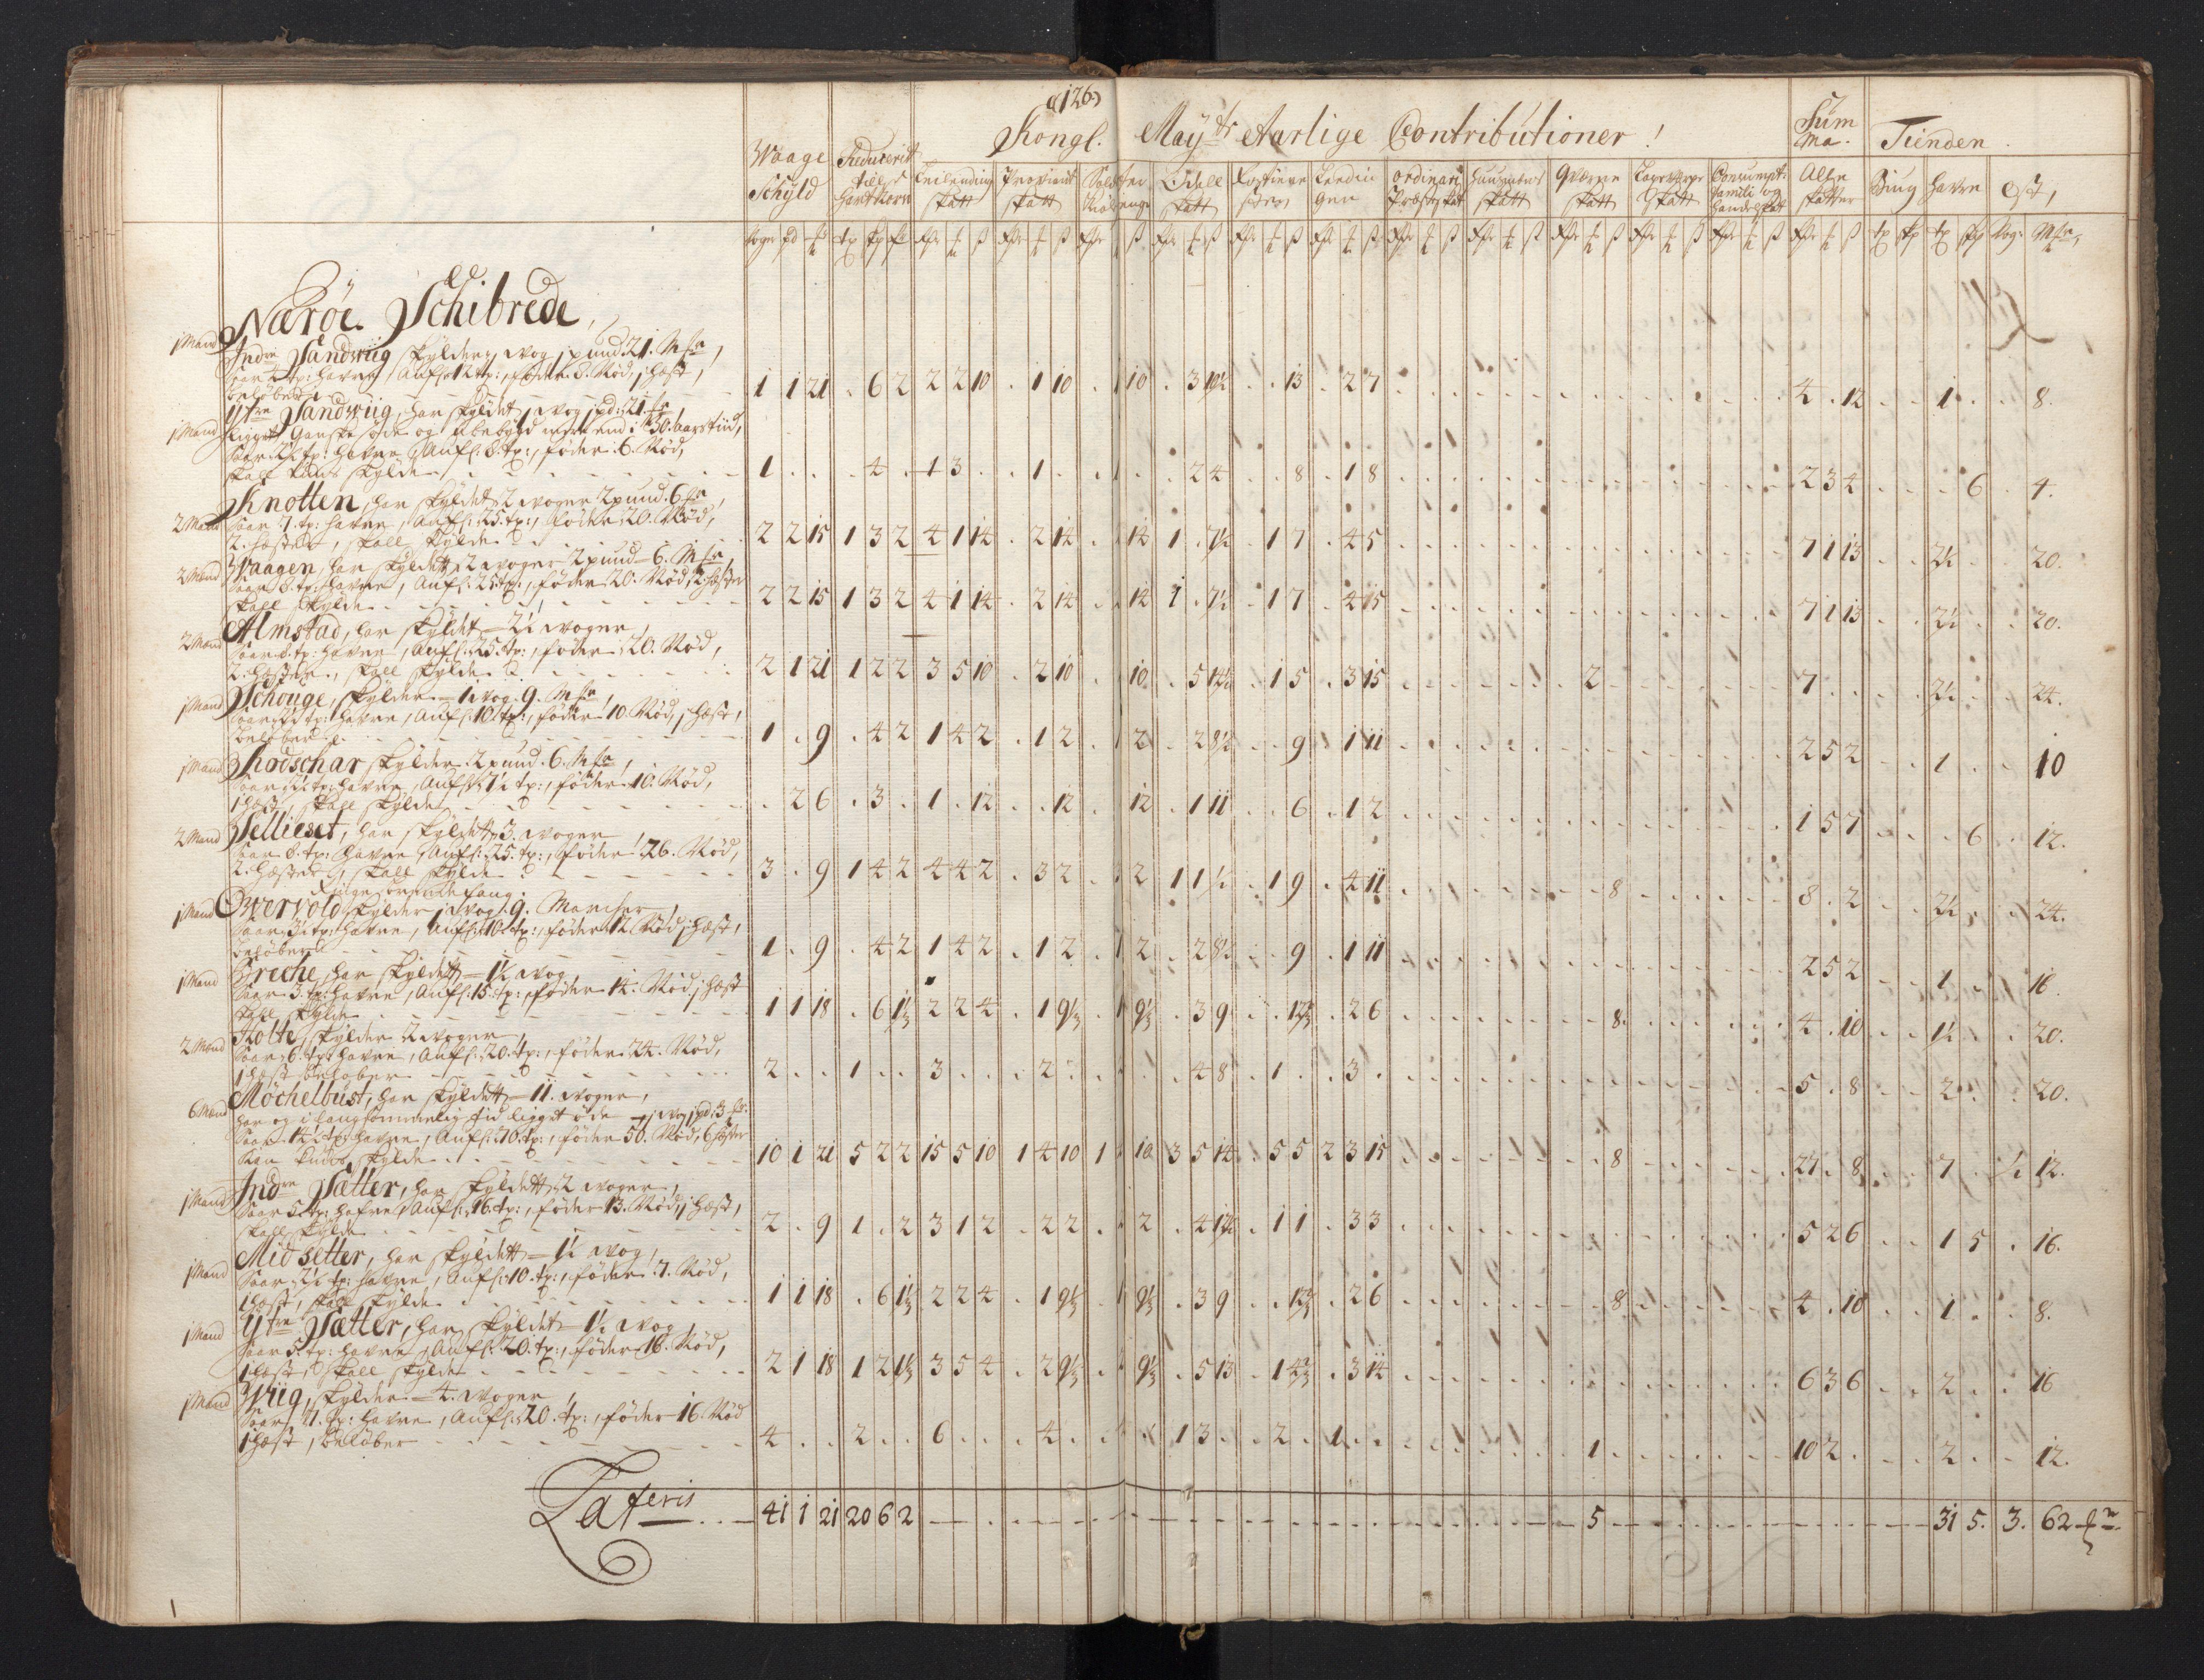 RA, Rentekammeret inntil 1814, Realistisk ordnet avdeling, N/Nb/Nbf/L0149: Sunnmøre, prøvematrikkel, 1714, s. 125b-126a